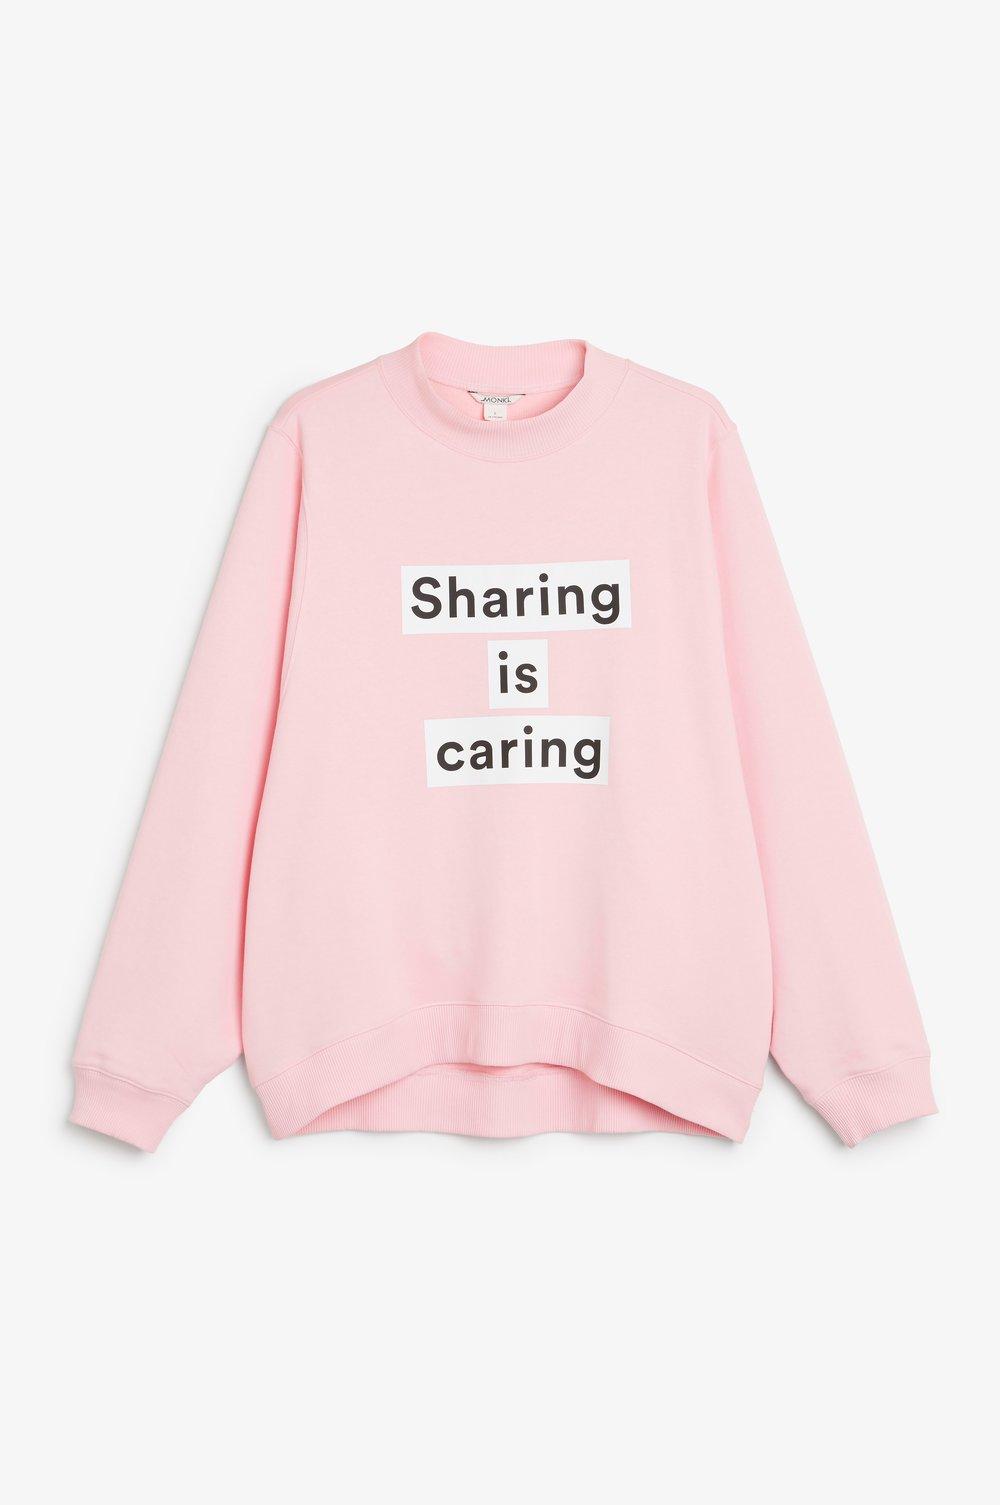 Monki Sharing is Caring £25.jpg